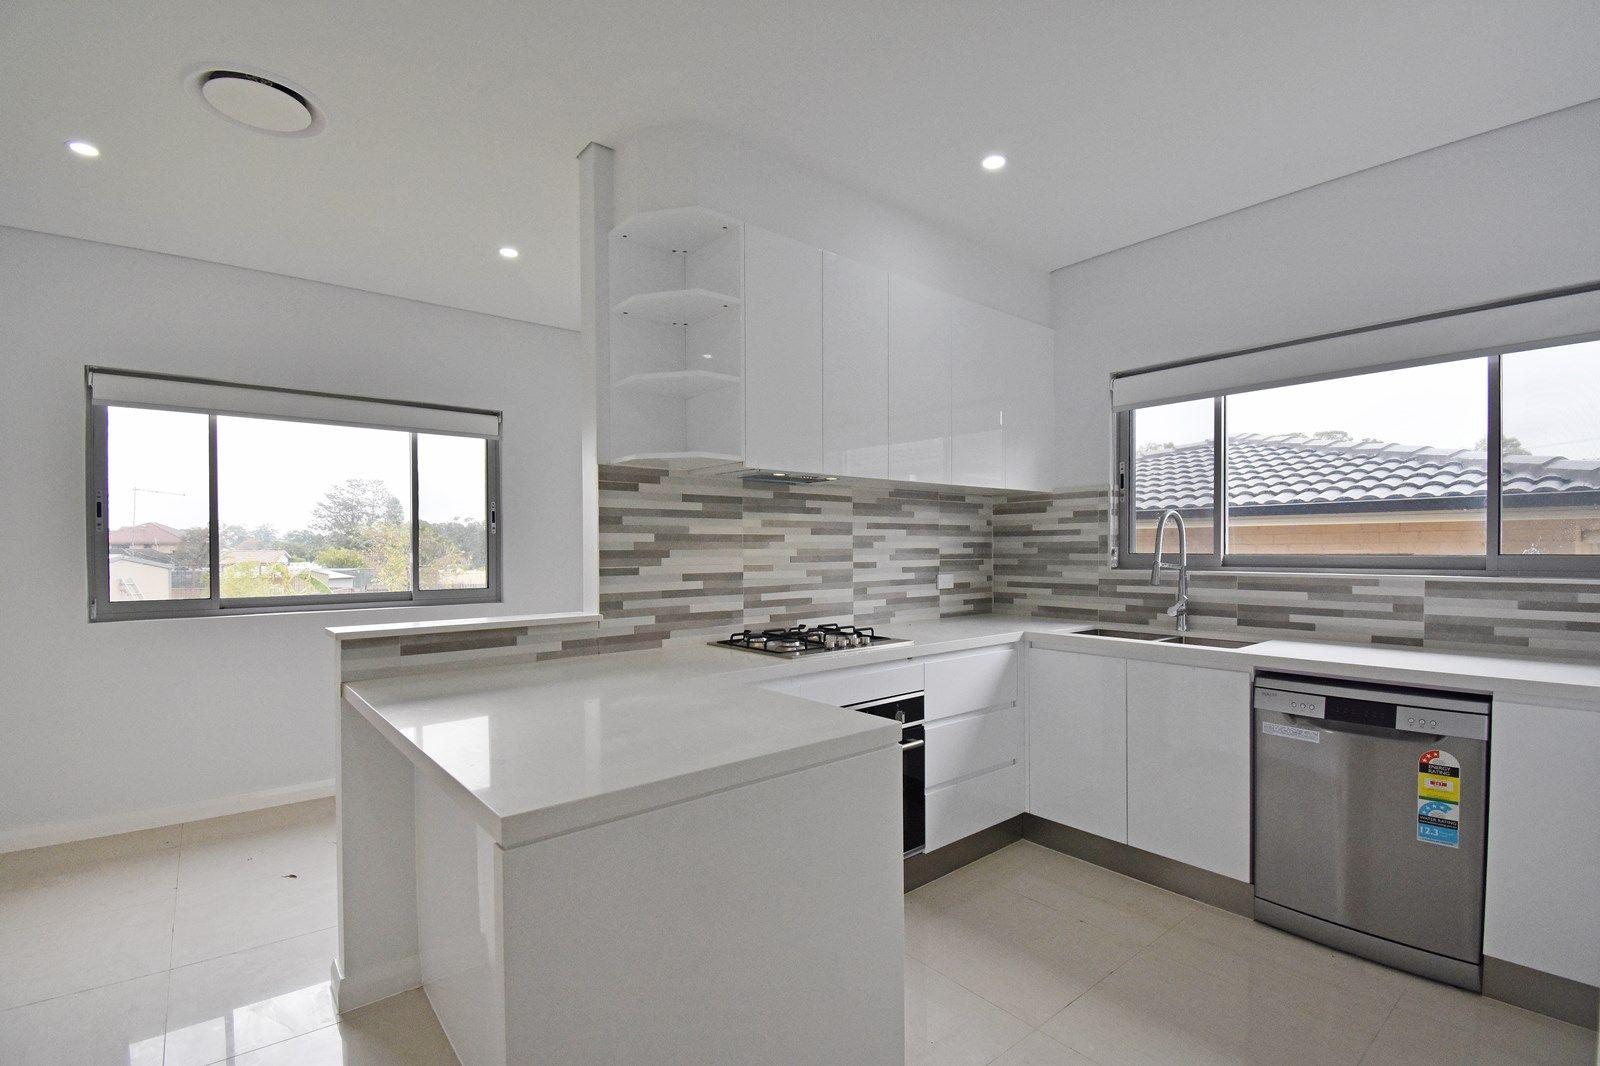 6/8-10 Gurrawillie Street, Villawood NSW 2163, Image 2